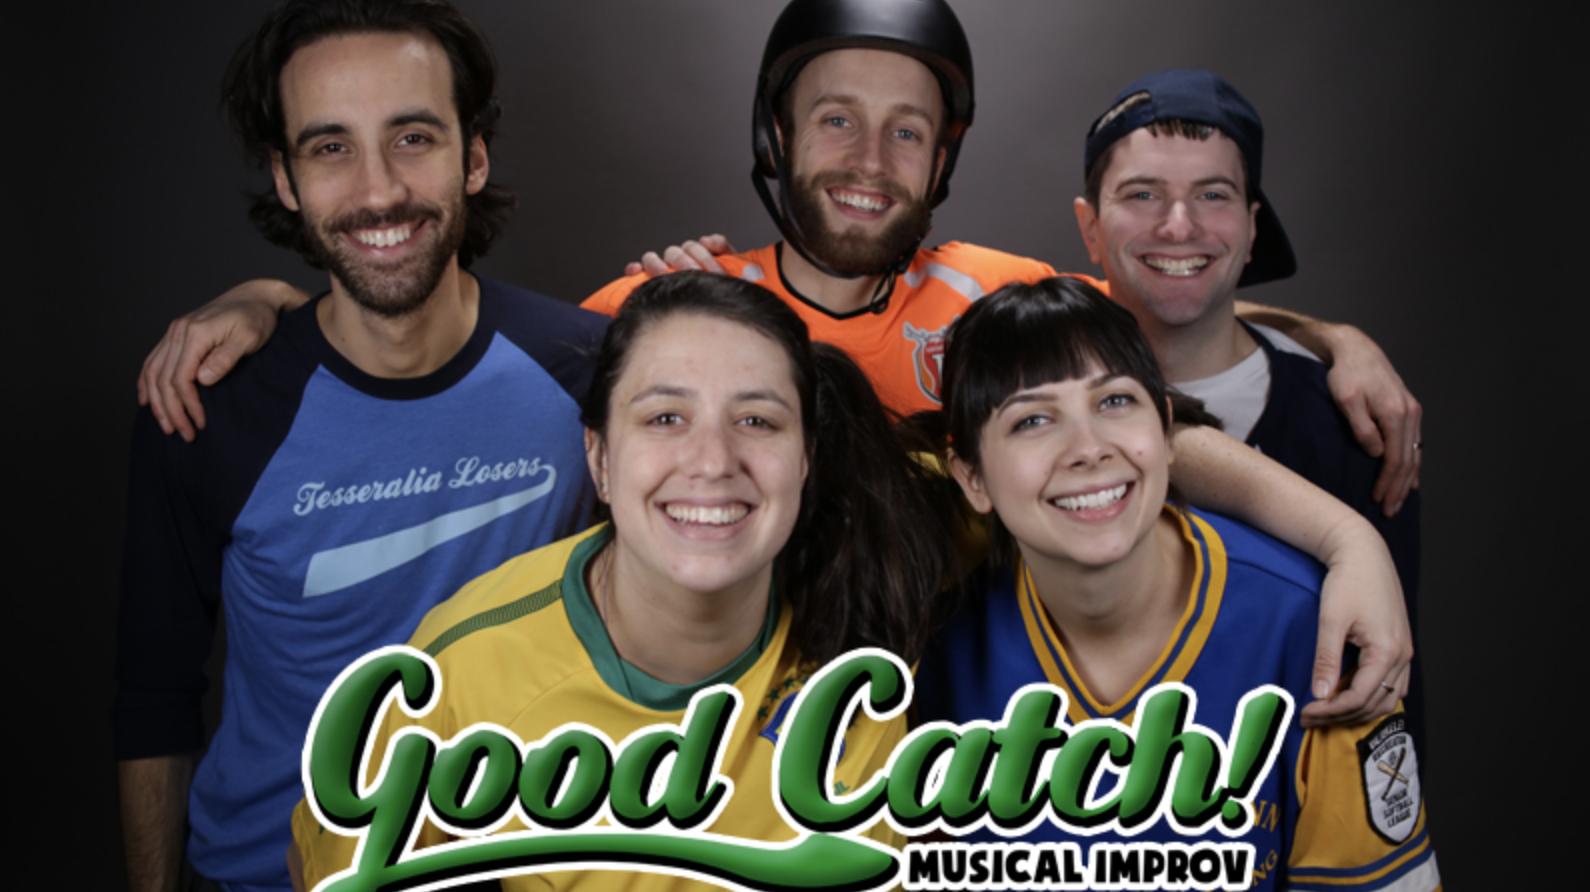 Musical Improv Comedy Group Good Catch